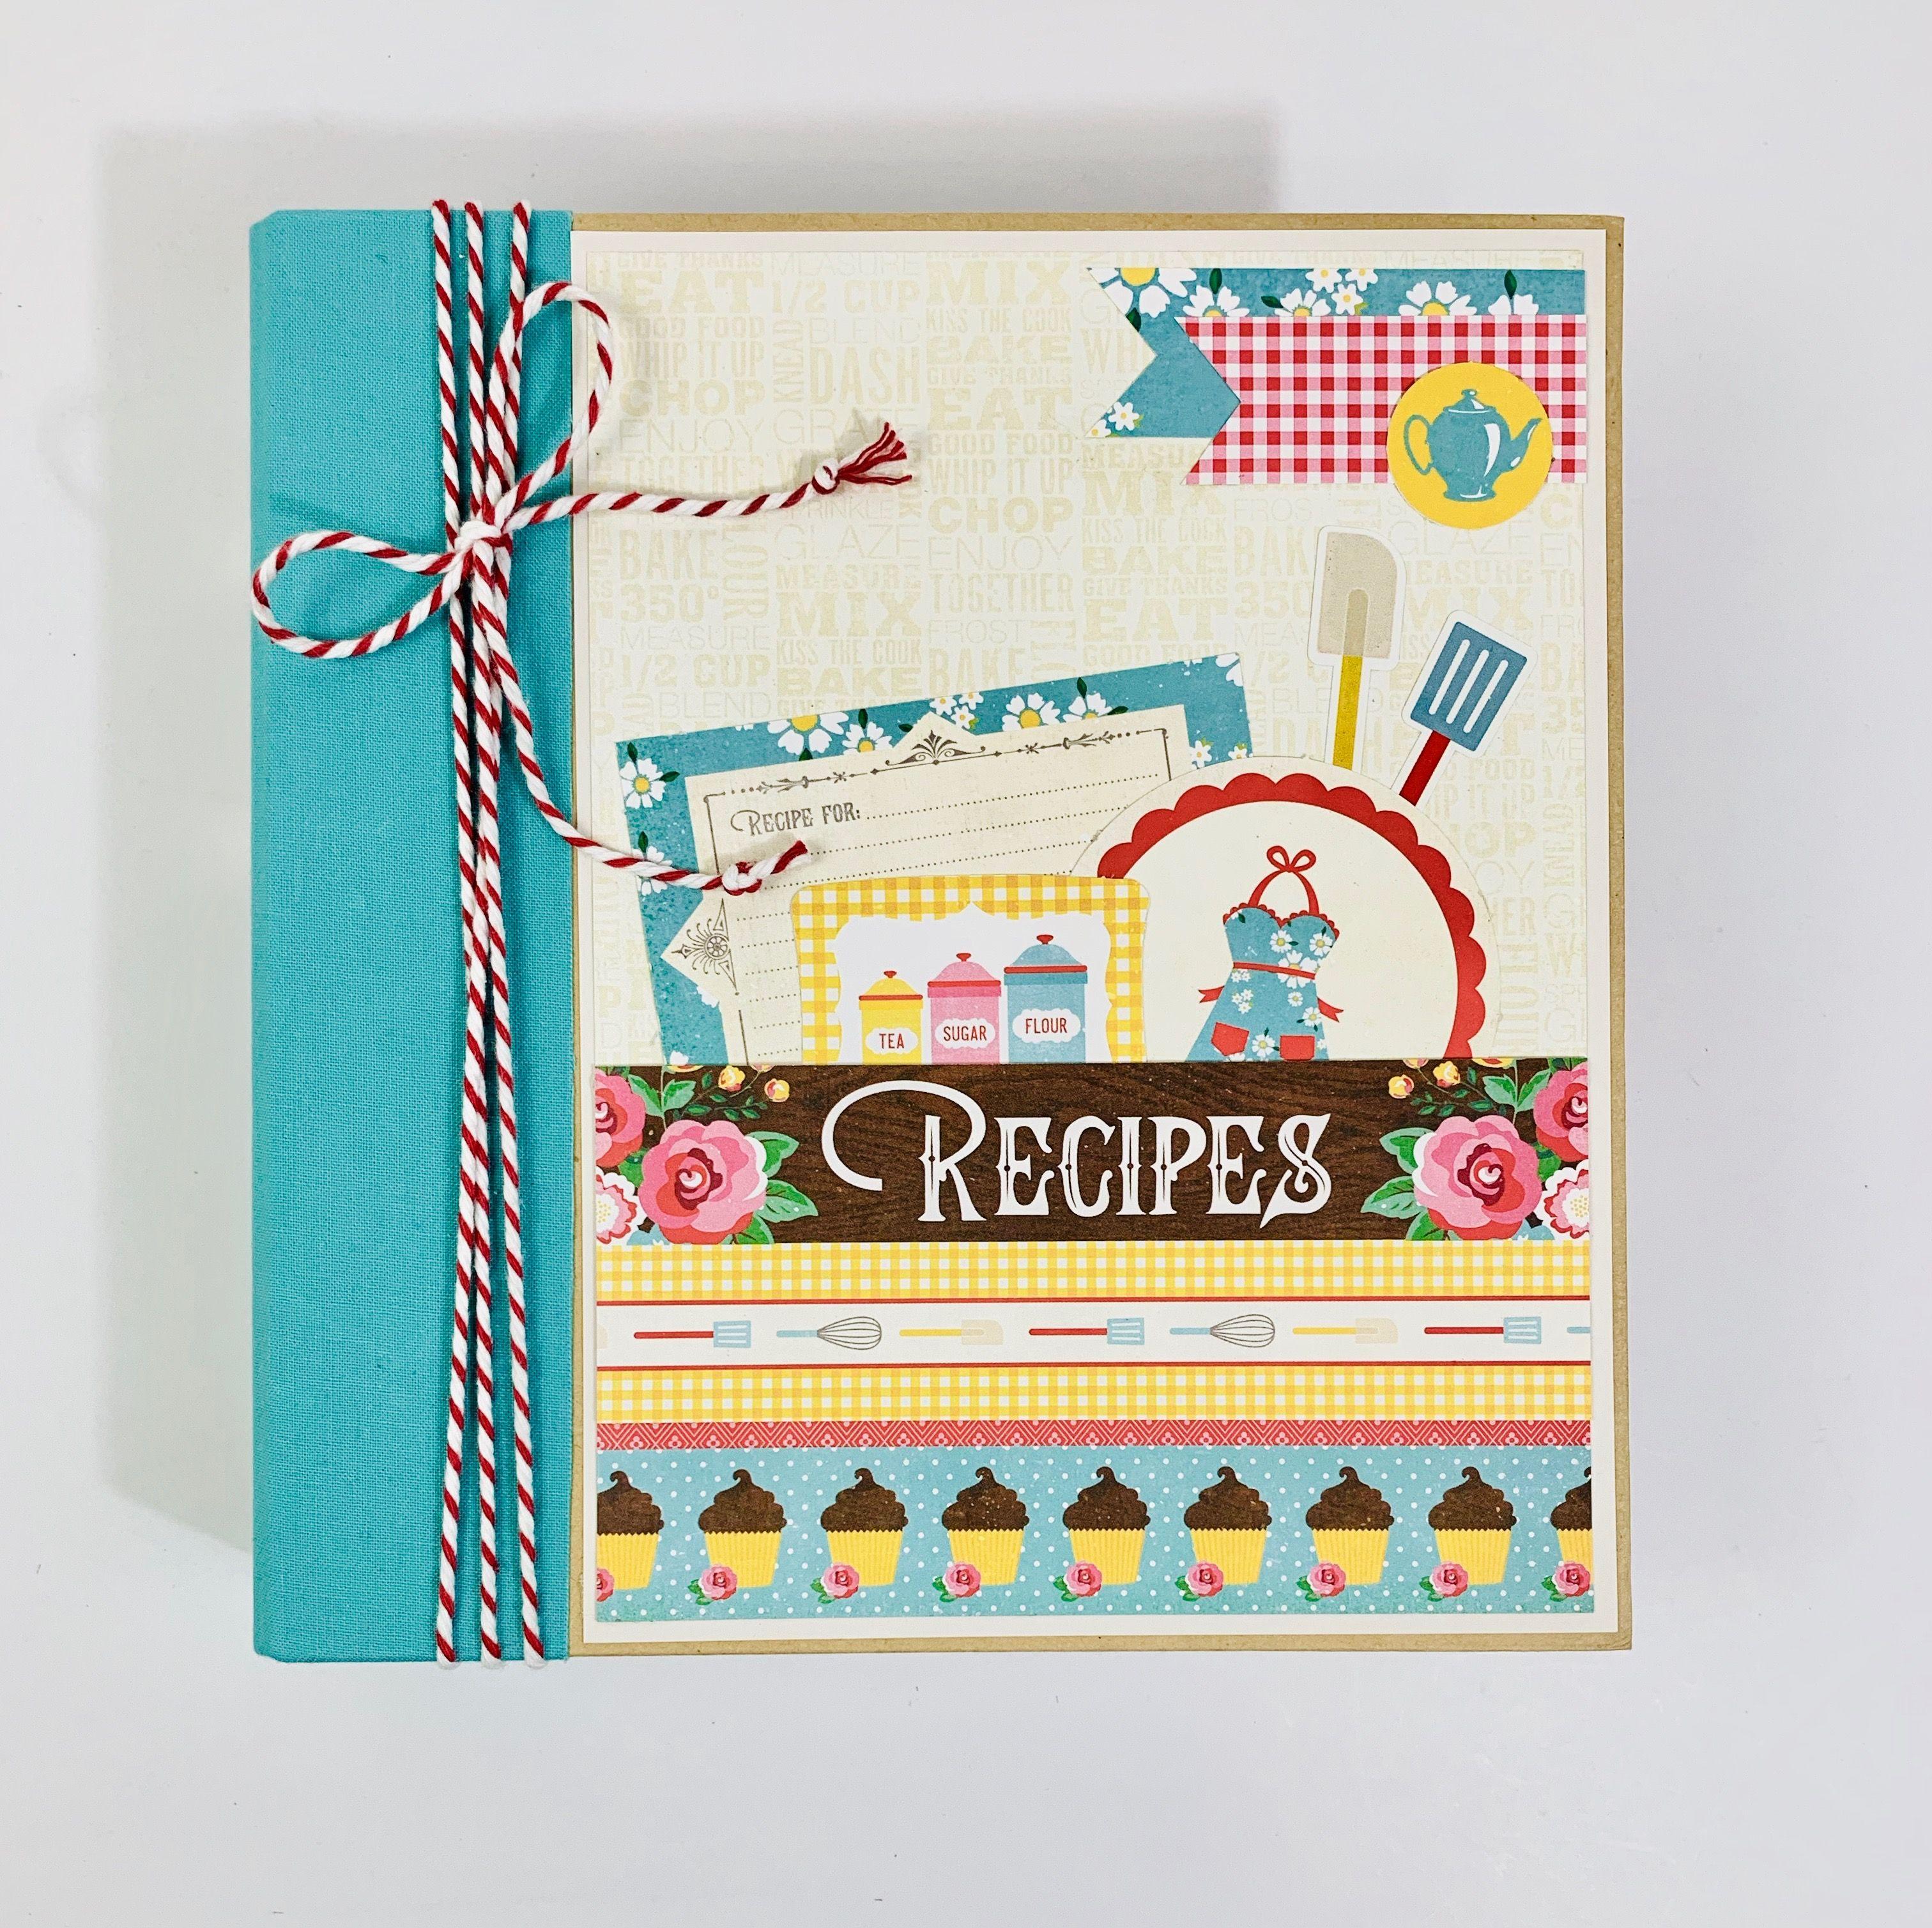 Handmade Diy Recipe Book Scrapbook Recipe Book Scrapbook Album Kits Recipe Book Diy